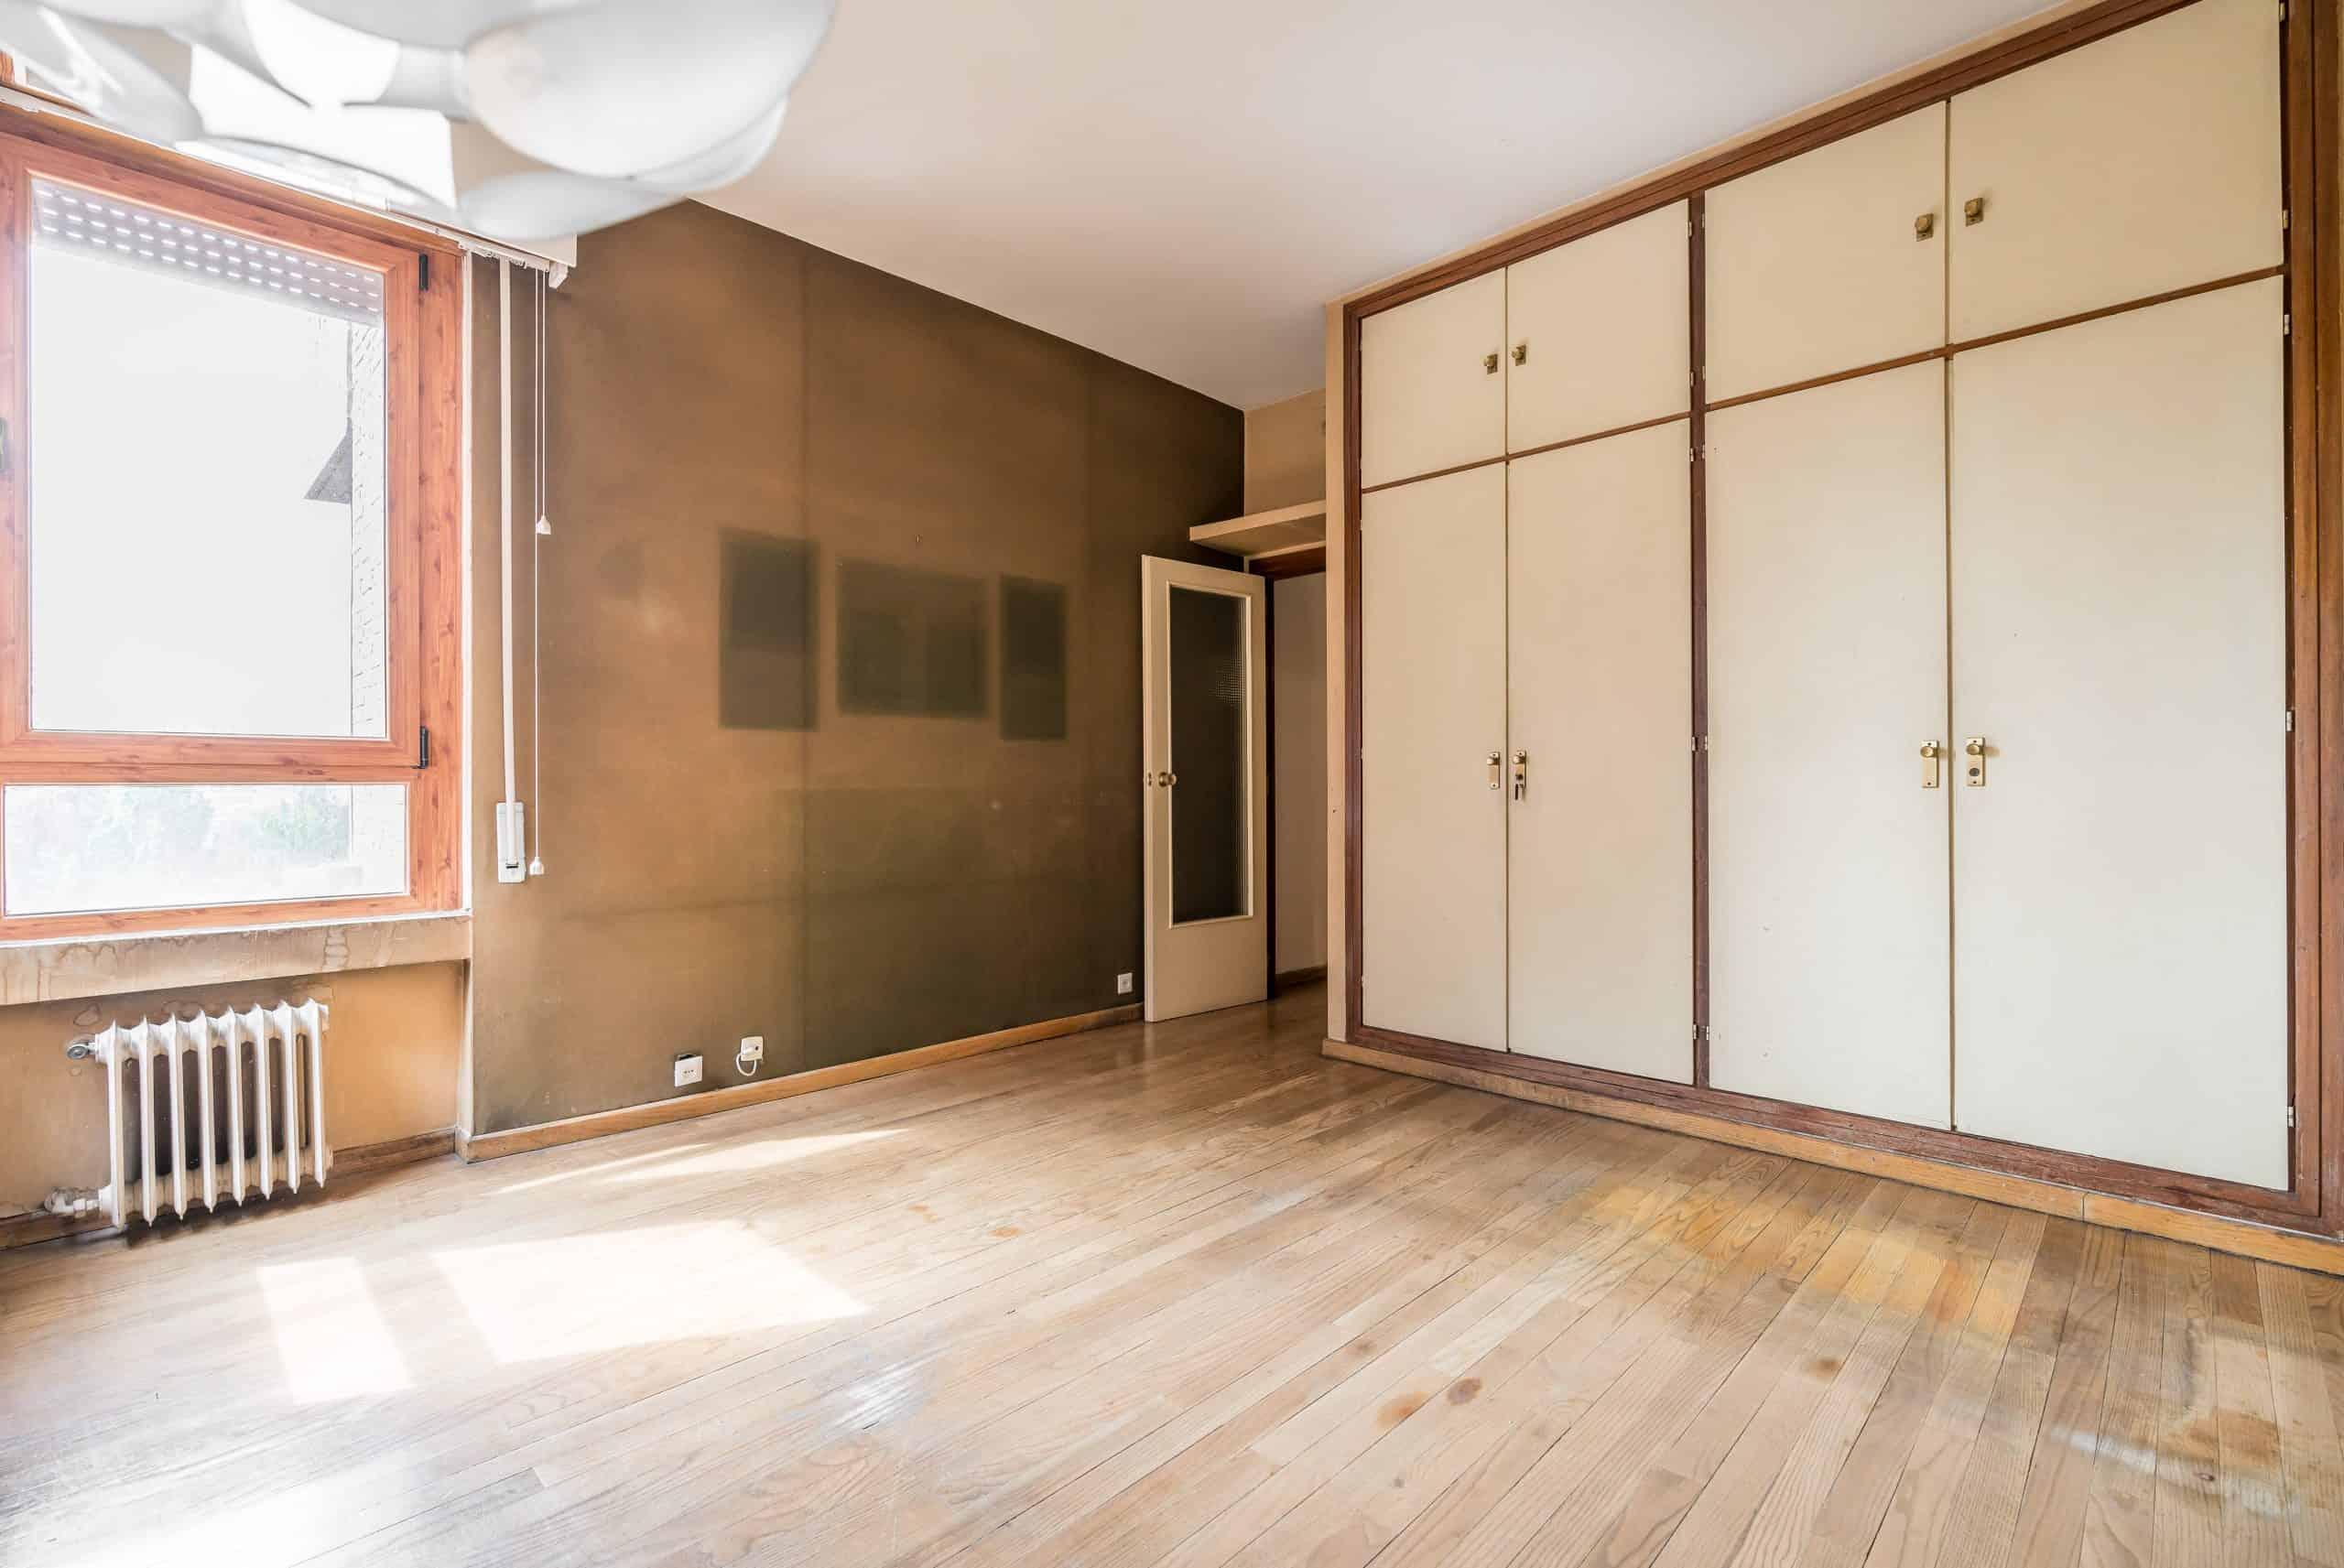 Agencia Inmobiliaria de Madrid-FUTUROCASA-Zona ARGANZUELA-EMBAJADORES-LEGAZPI -calle Embajadores- baño 17